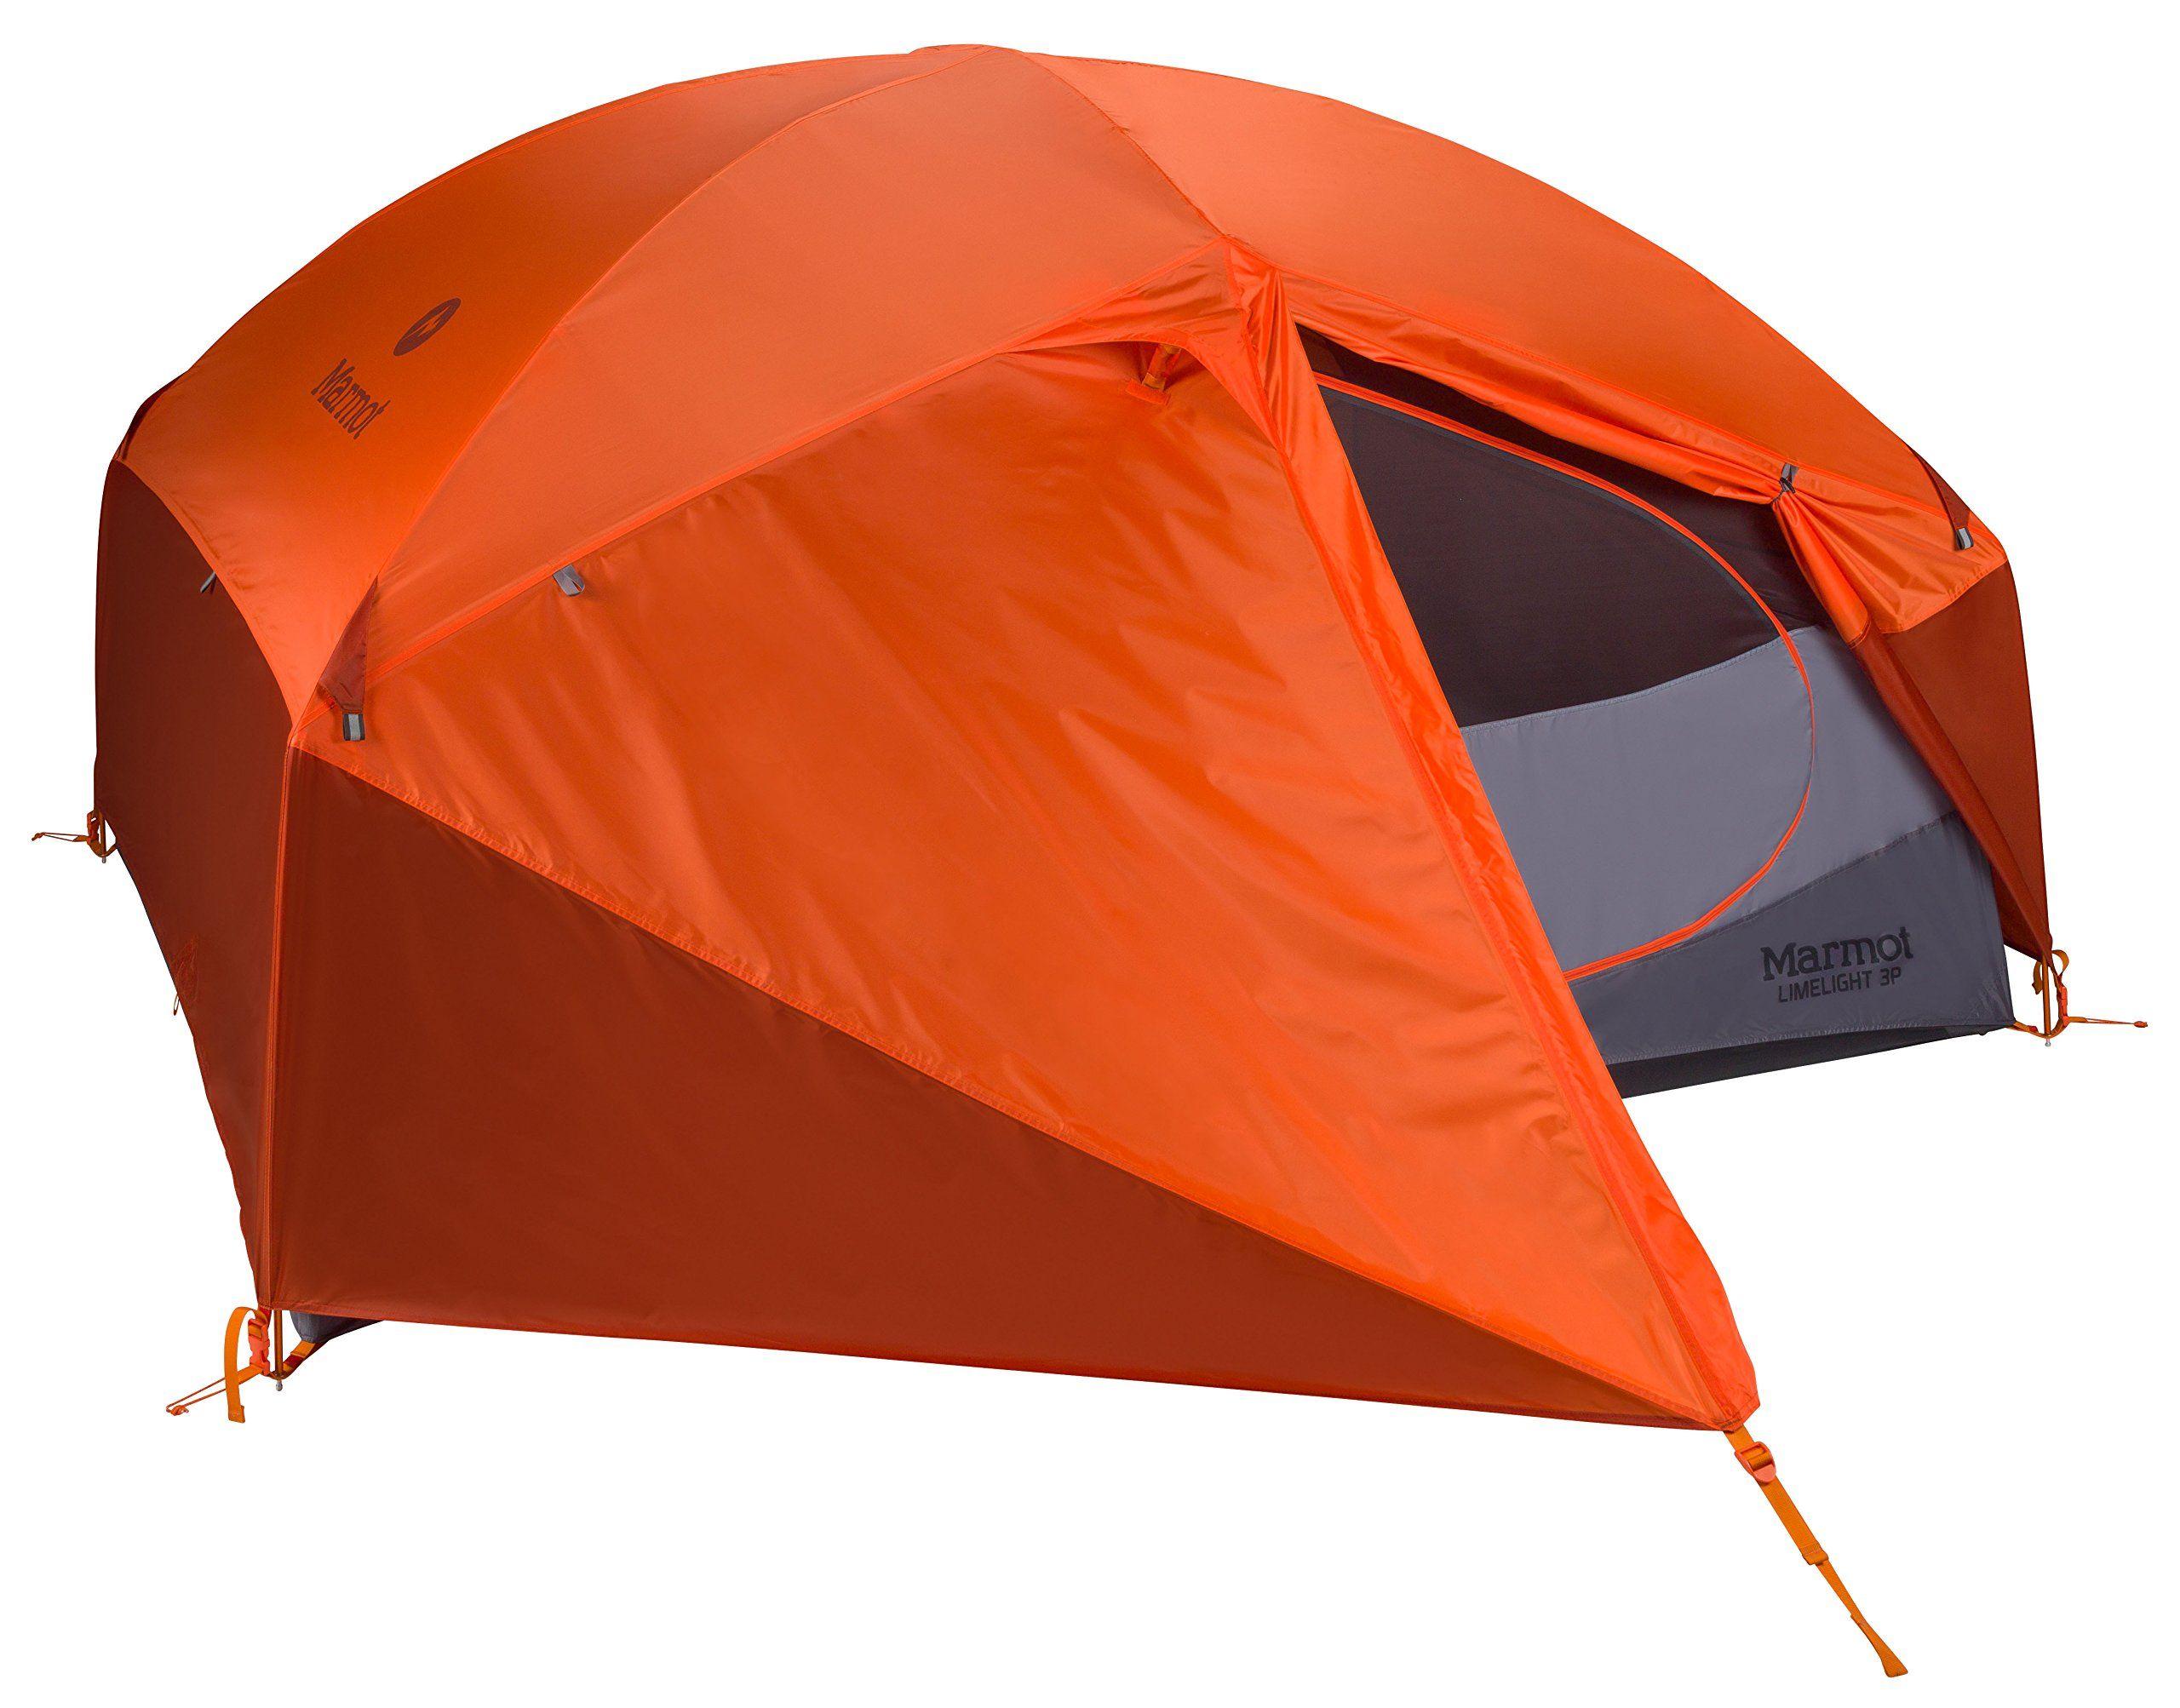 Marmot Unisex Limelight 3P Tent Cinder/Rusted Orange Tent One Size. Gearloft u0026 Footprint  sc 1 st  Pinterest & Marmot Unisex Limelight 3P Tent Cinder/Rusted Orange Tent One Size ...